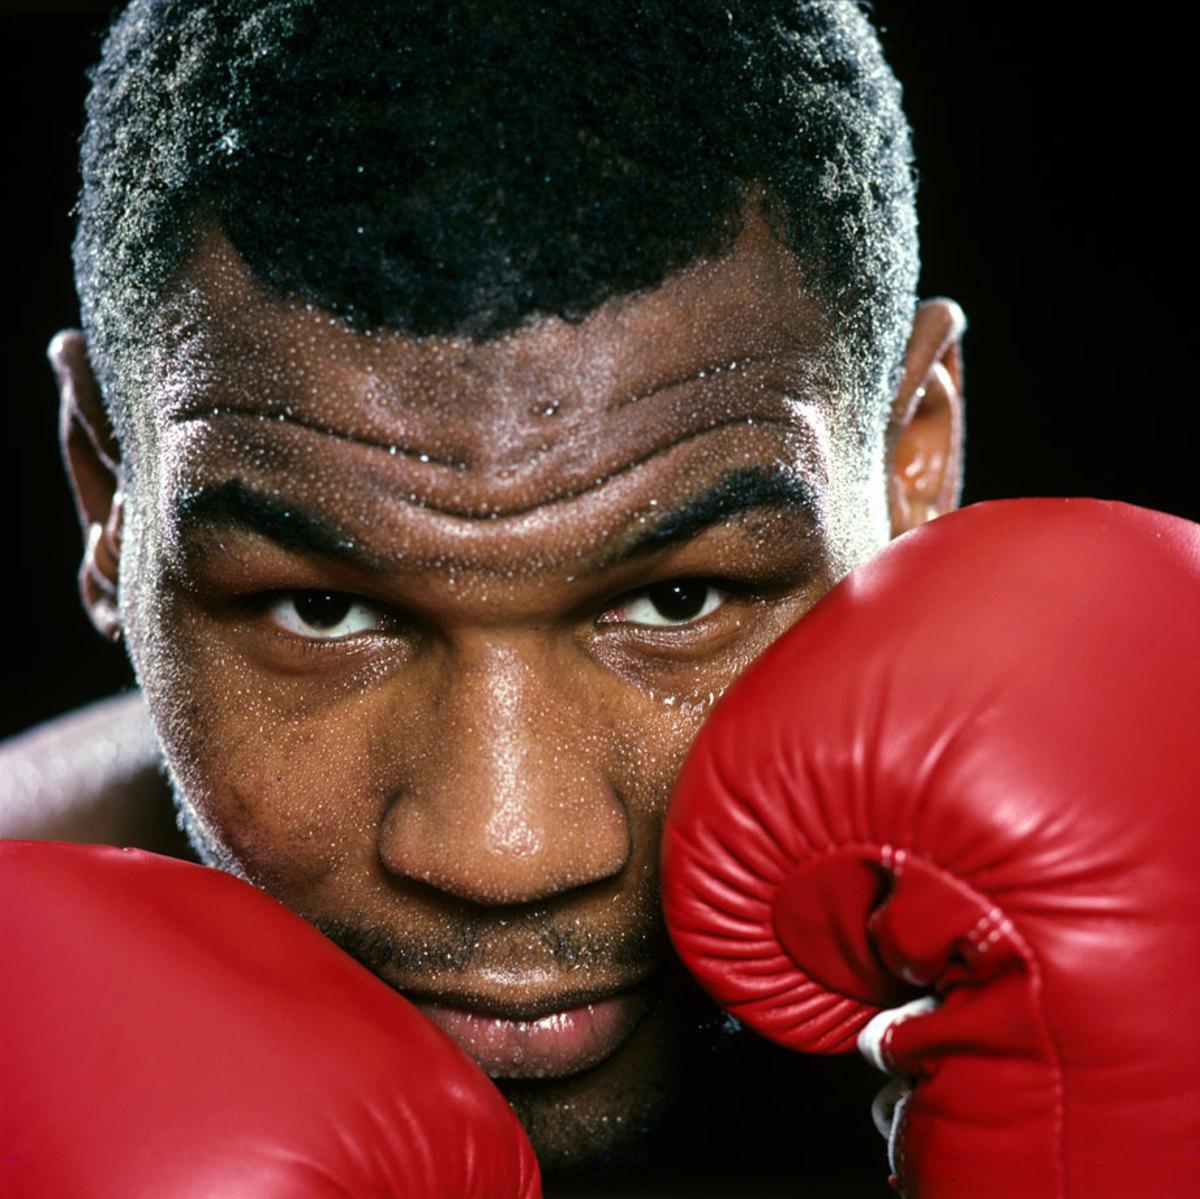 11-Mike-Tyson-NLC_05245.jpg